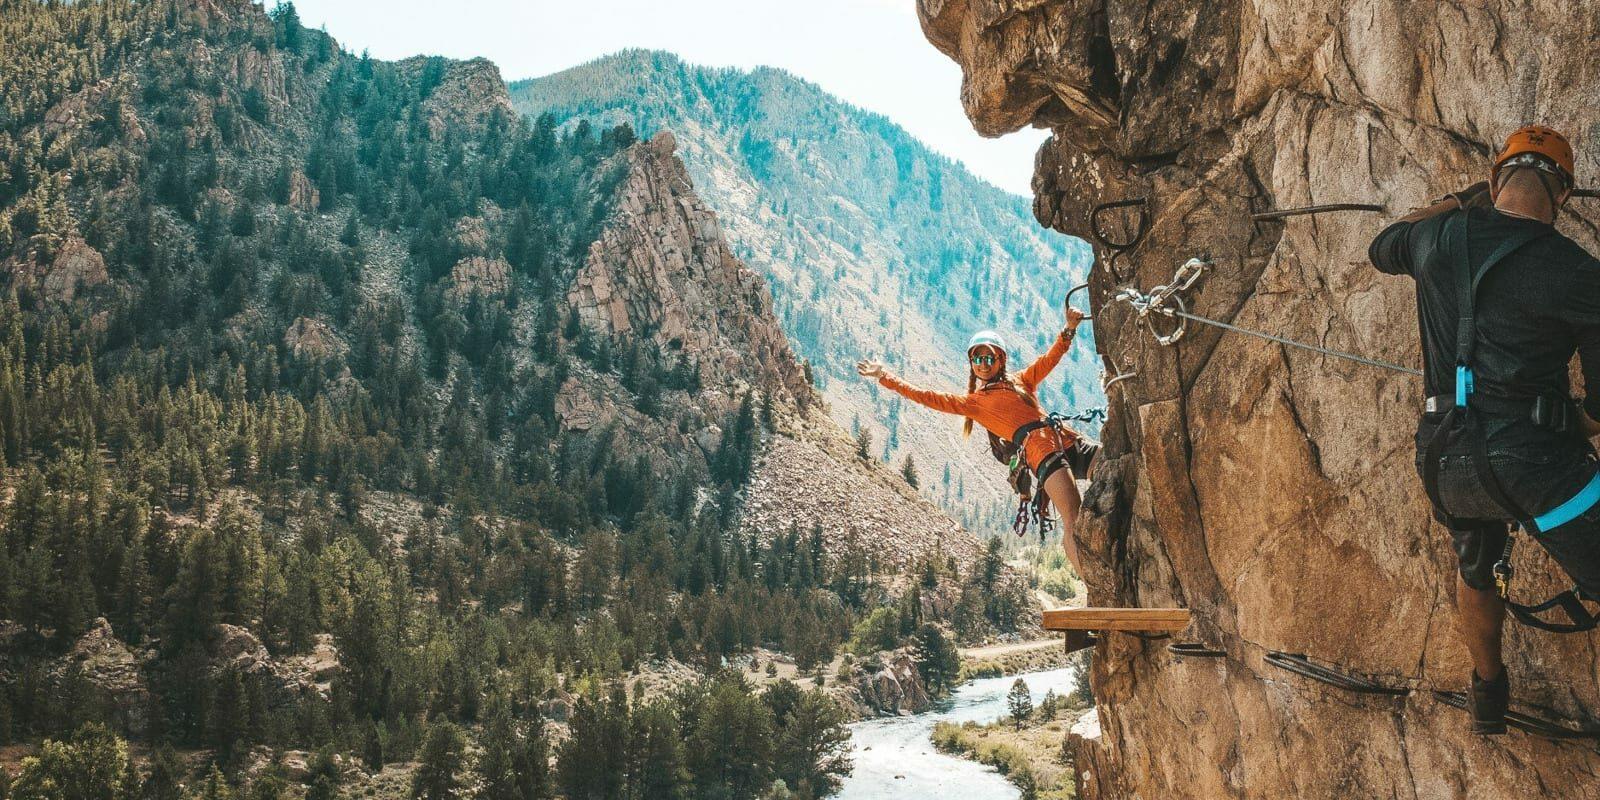 Image of a woman on the Granite Via Ferrata hanging off the cliff in Buena Vista, Colorado